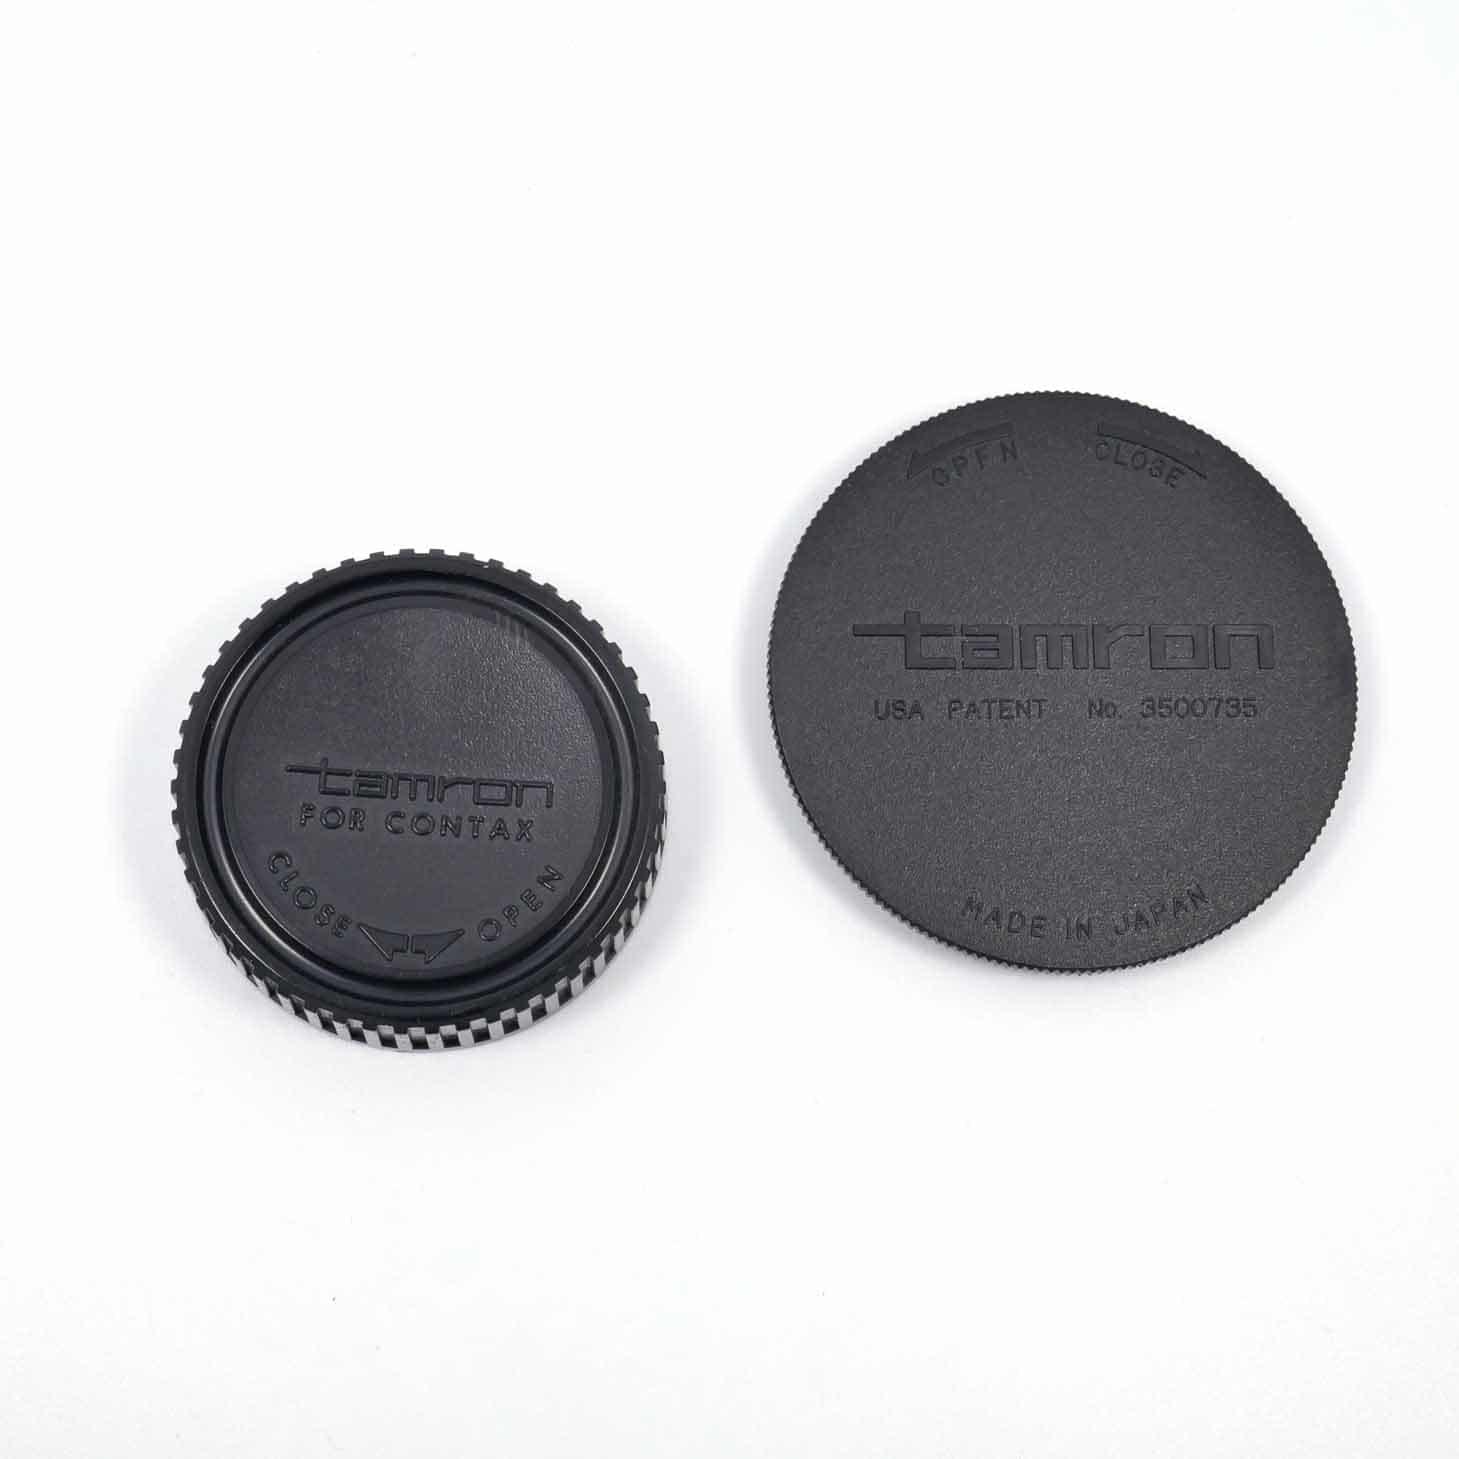 clean-cameras-Tamron-Adaptall-Contax-01